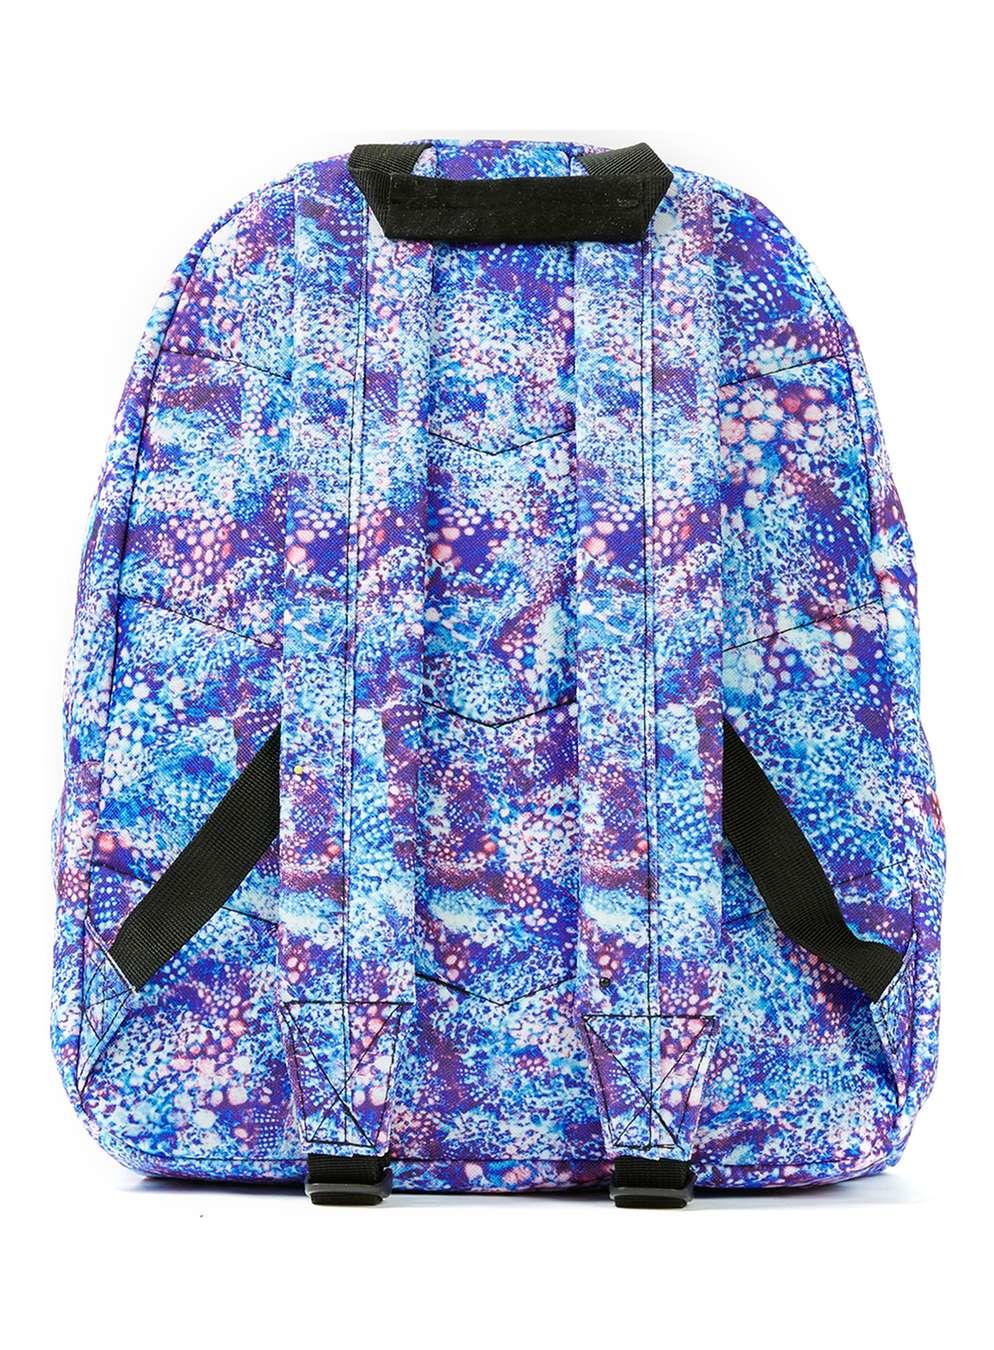 fb88ffbe60b Hype Bubblegum Backpack  in Blue for Men - Lyst